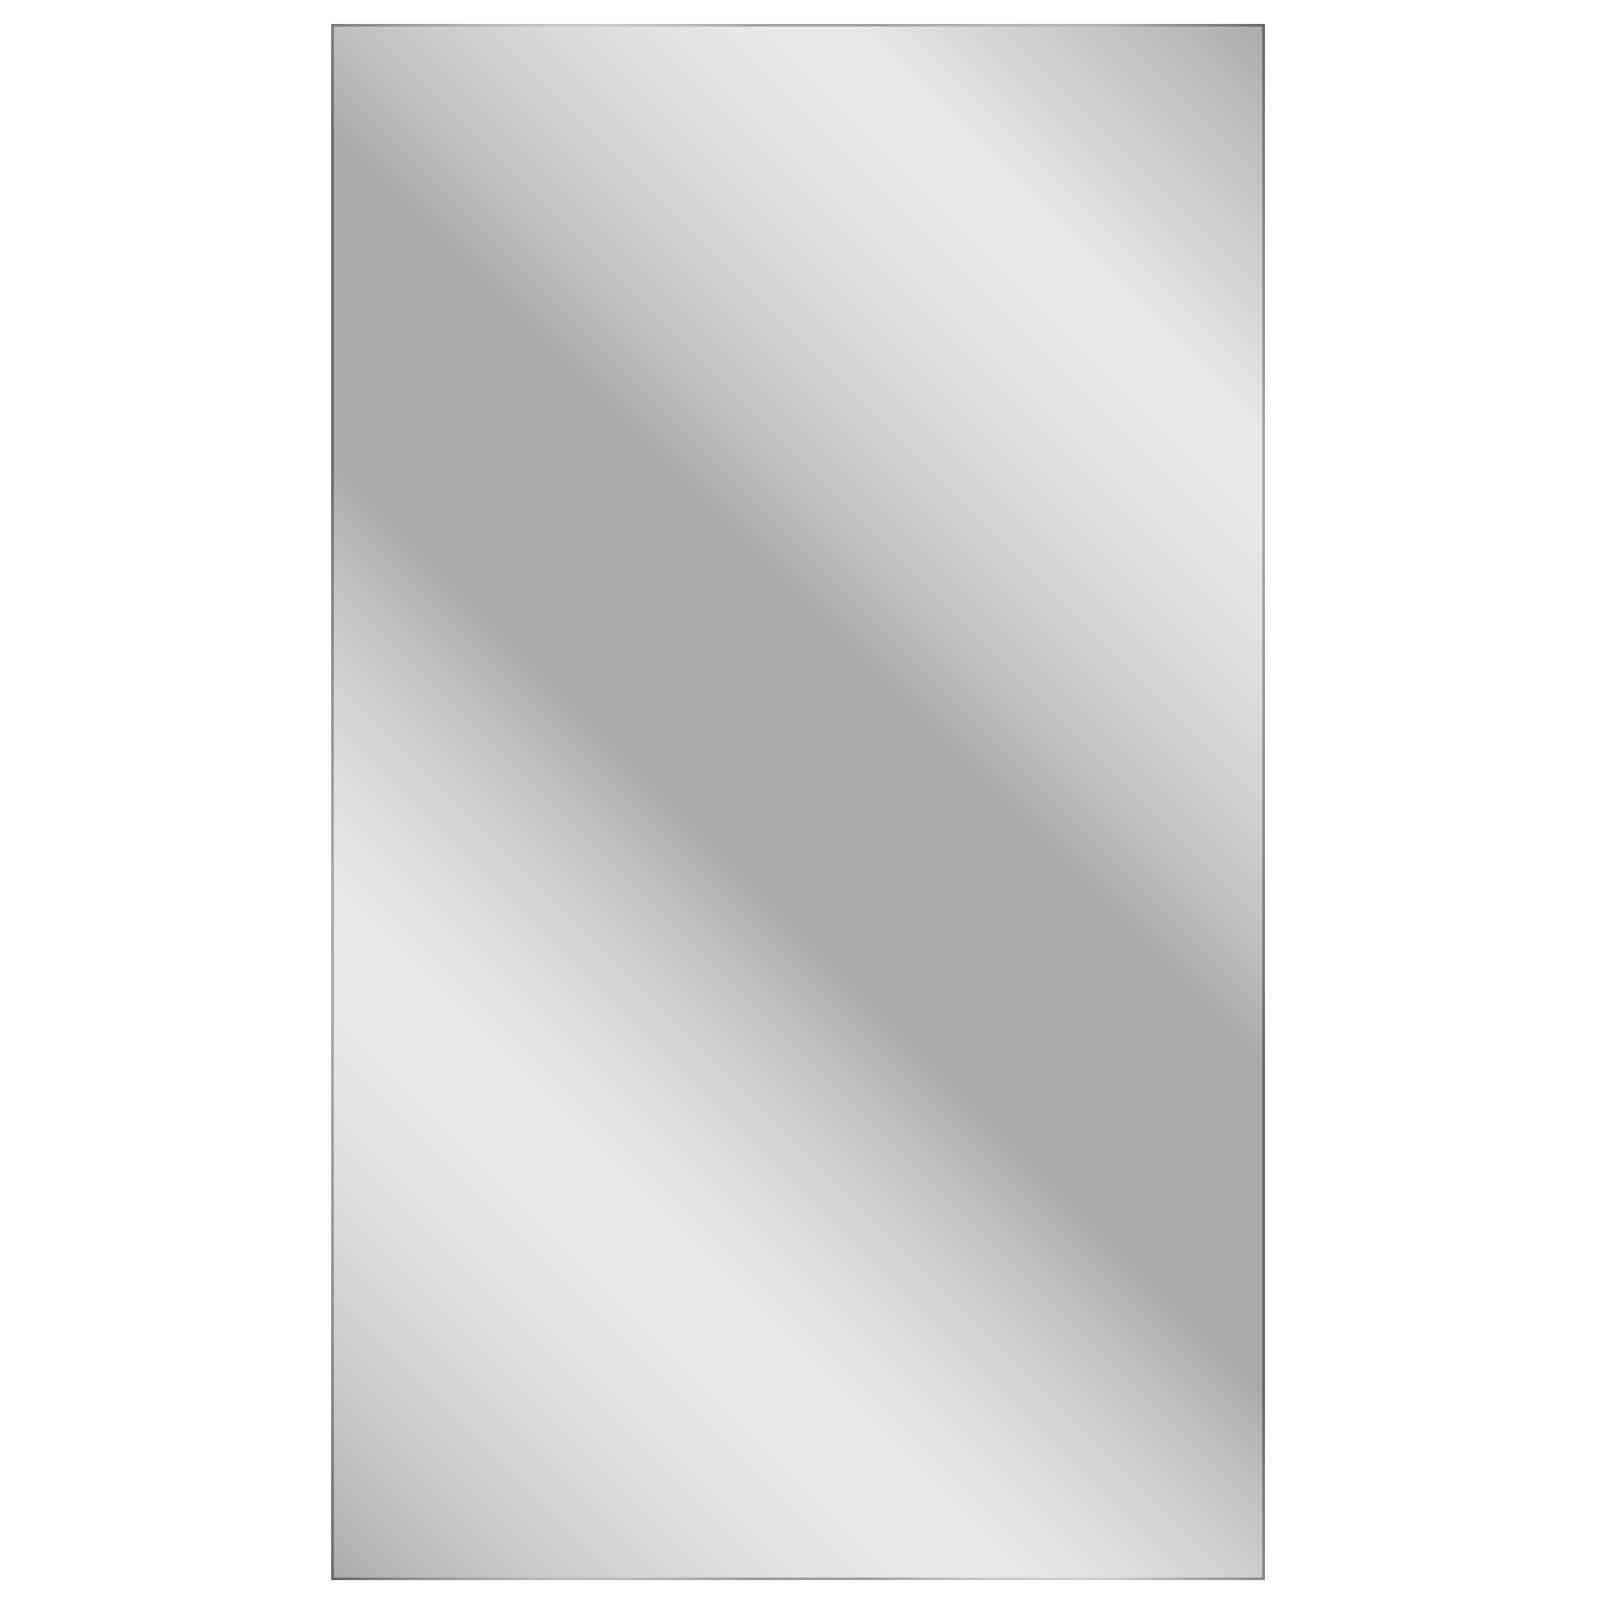 Living Elements 1500 x 900 x 5mm Flat Edge Mirror